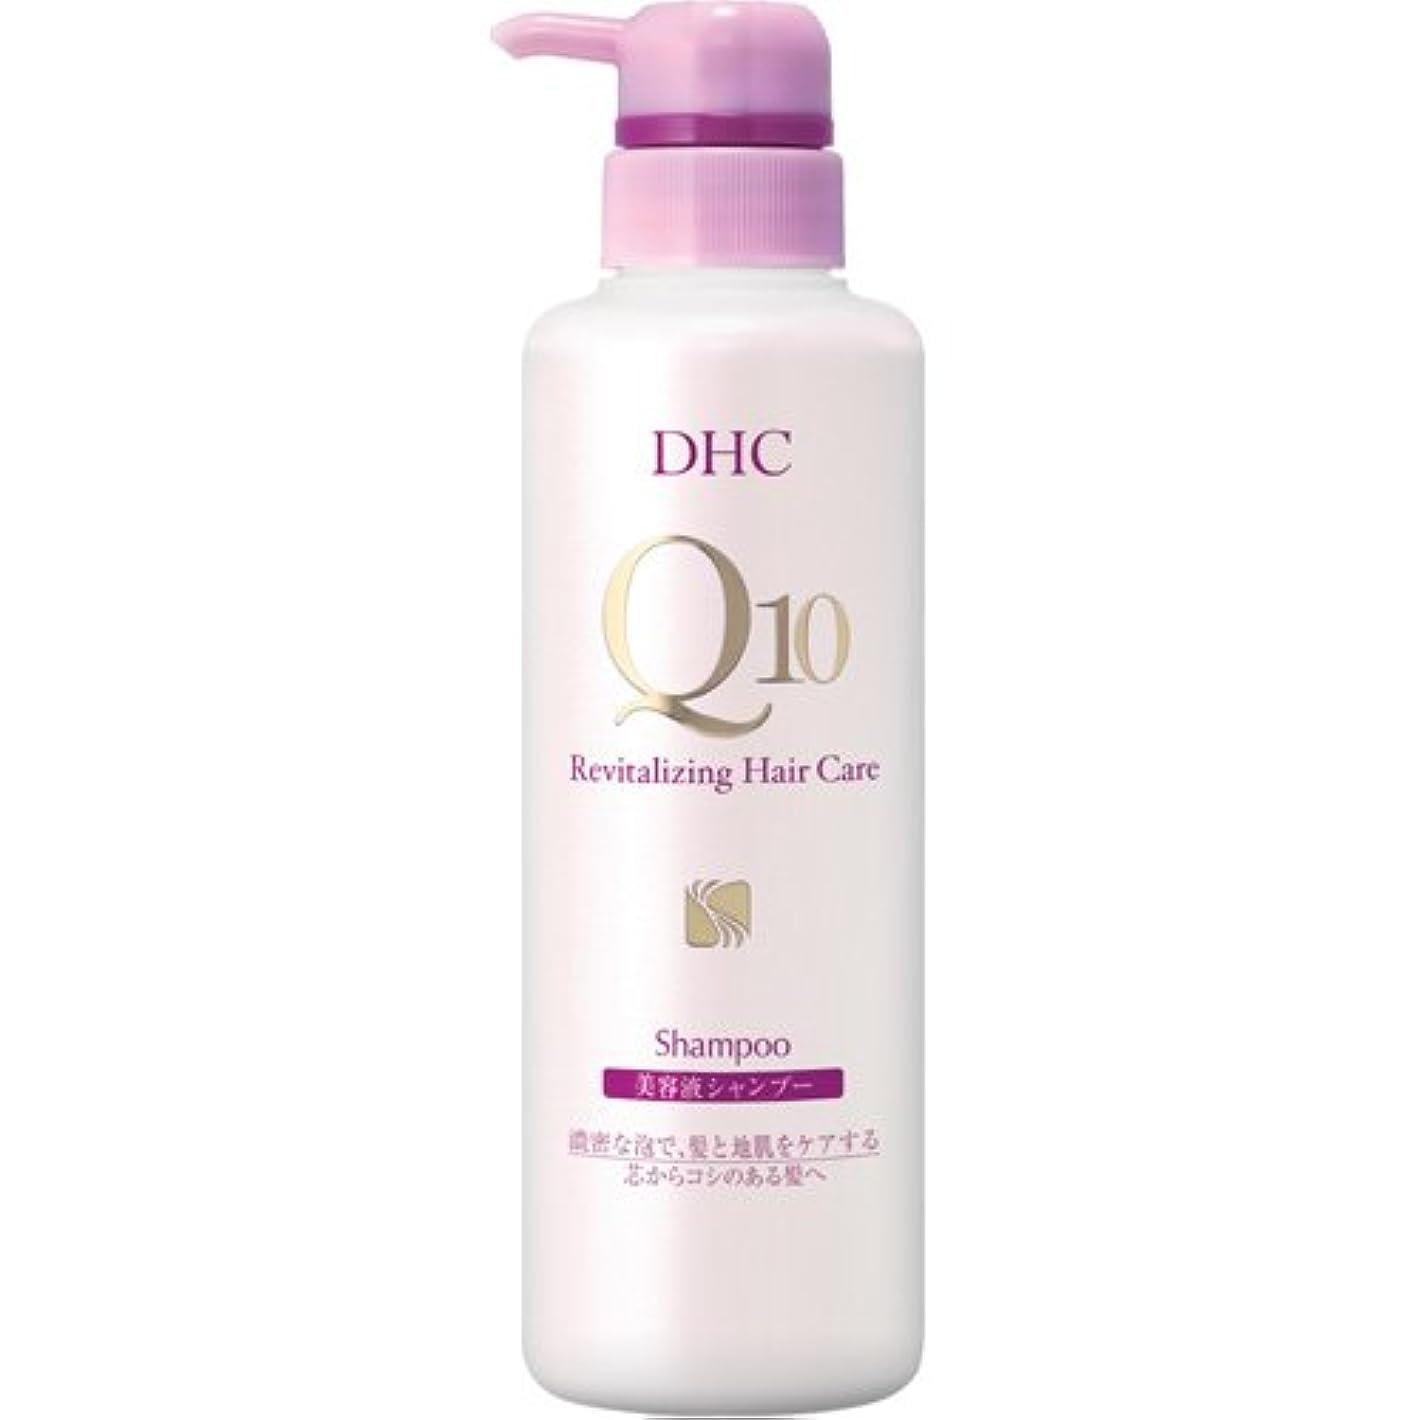 DHC Q10美容液 シャンプー (SS) 330ml